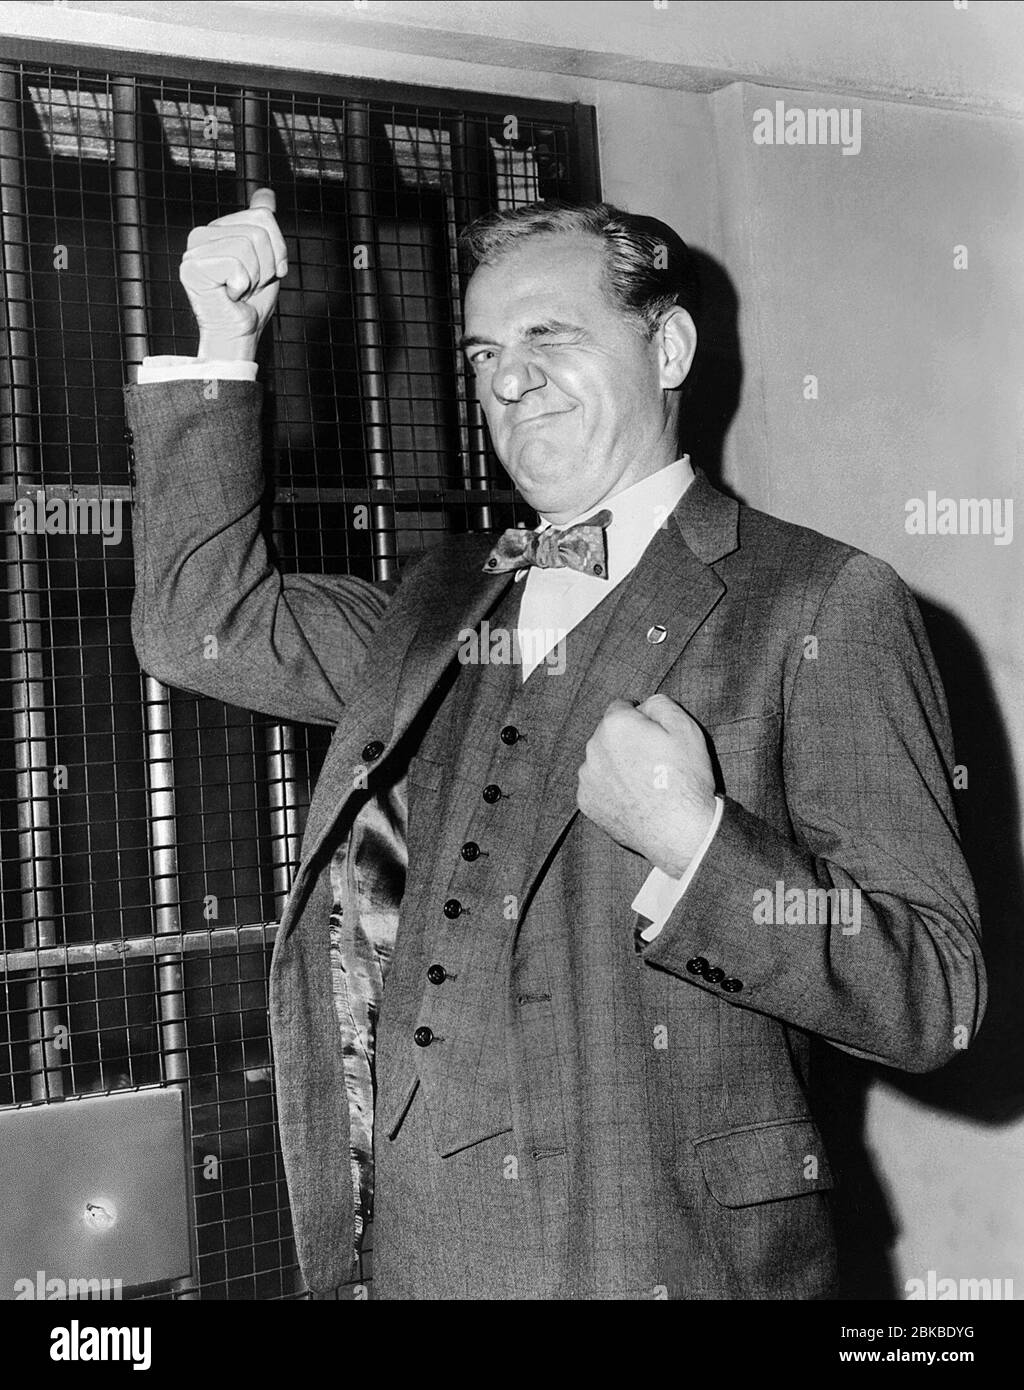 KARL MALDEN, THE BIRDMAN OF ALCATRAZ, 1962 Stock Photo